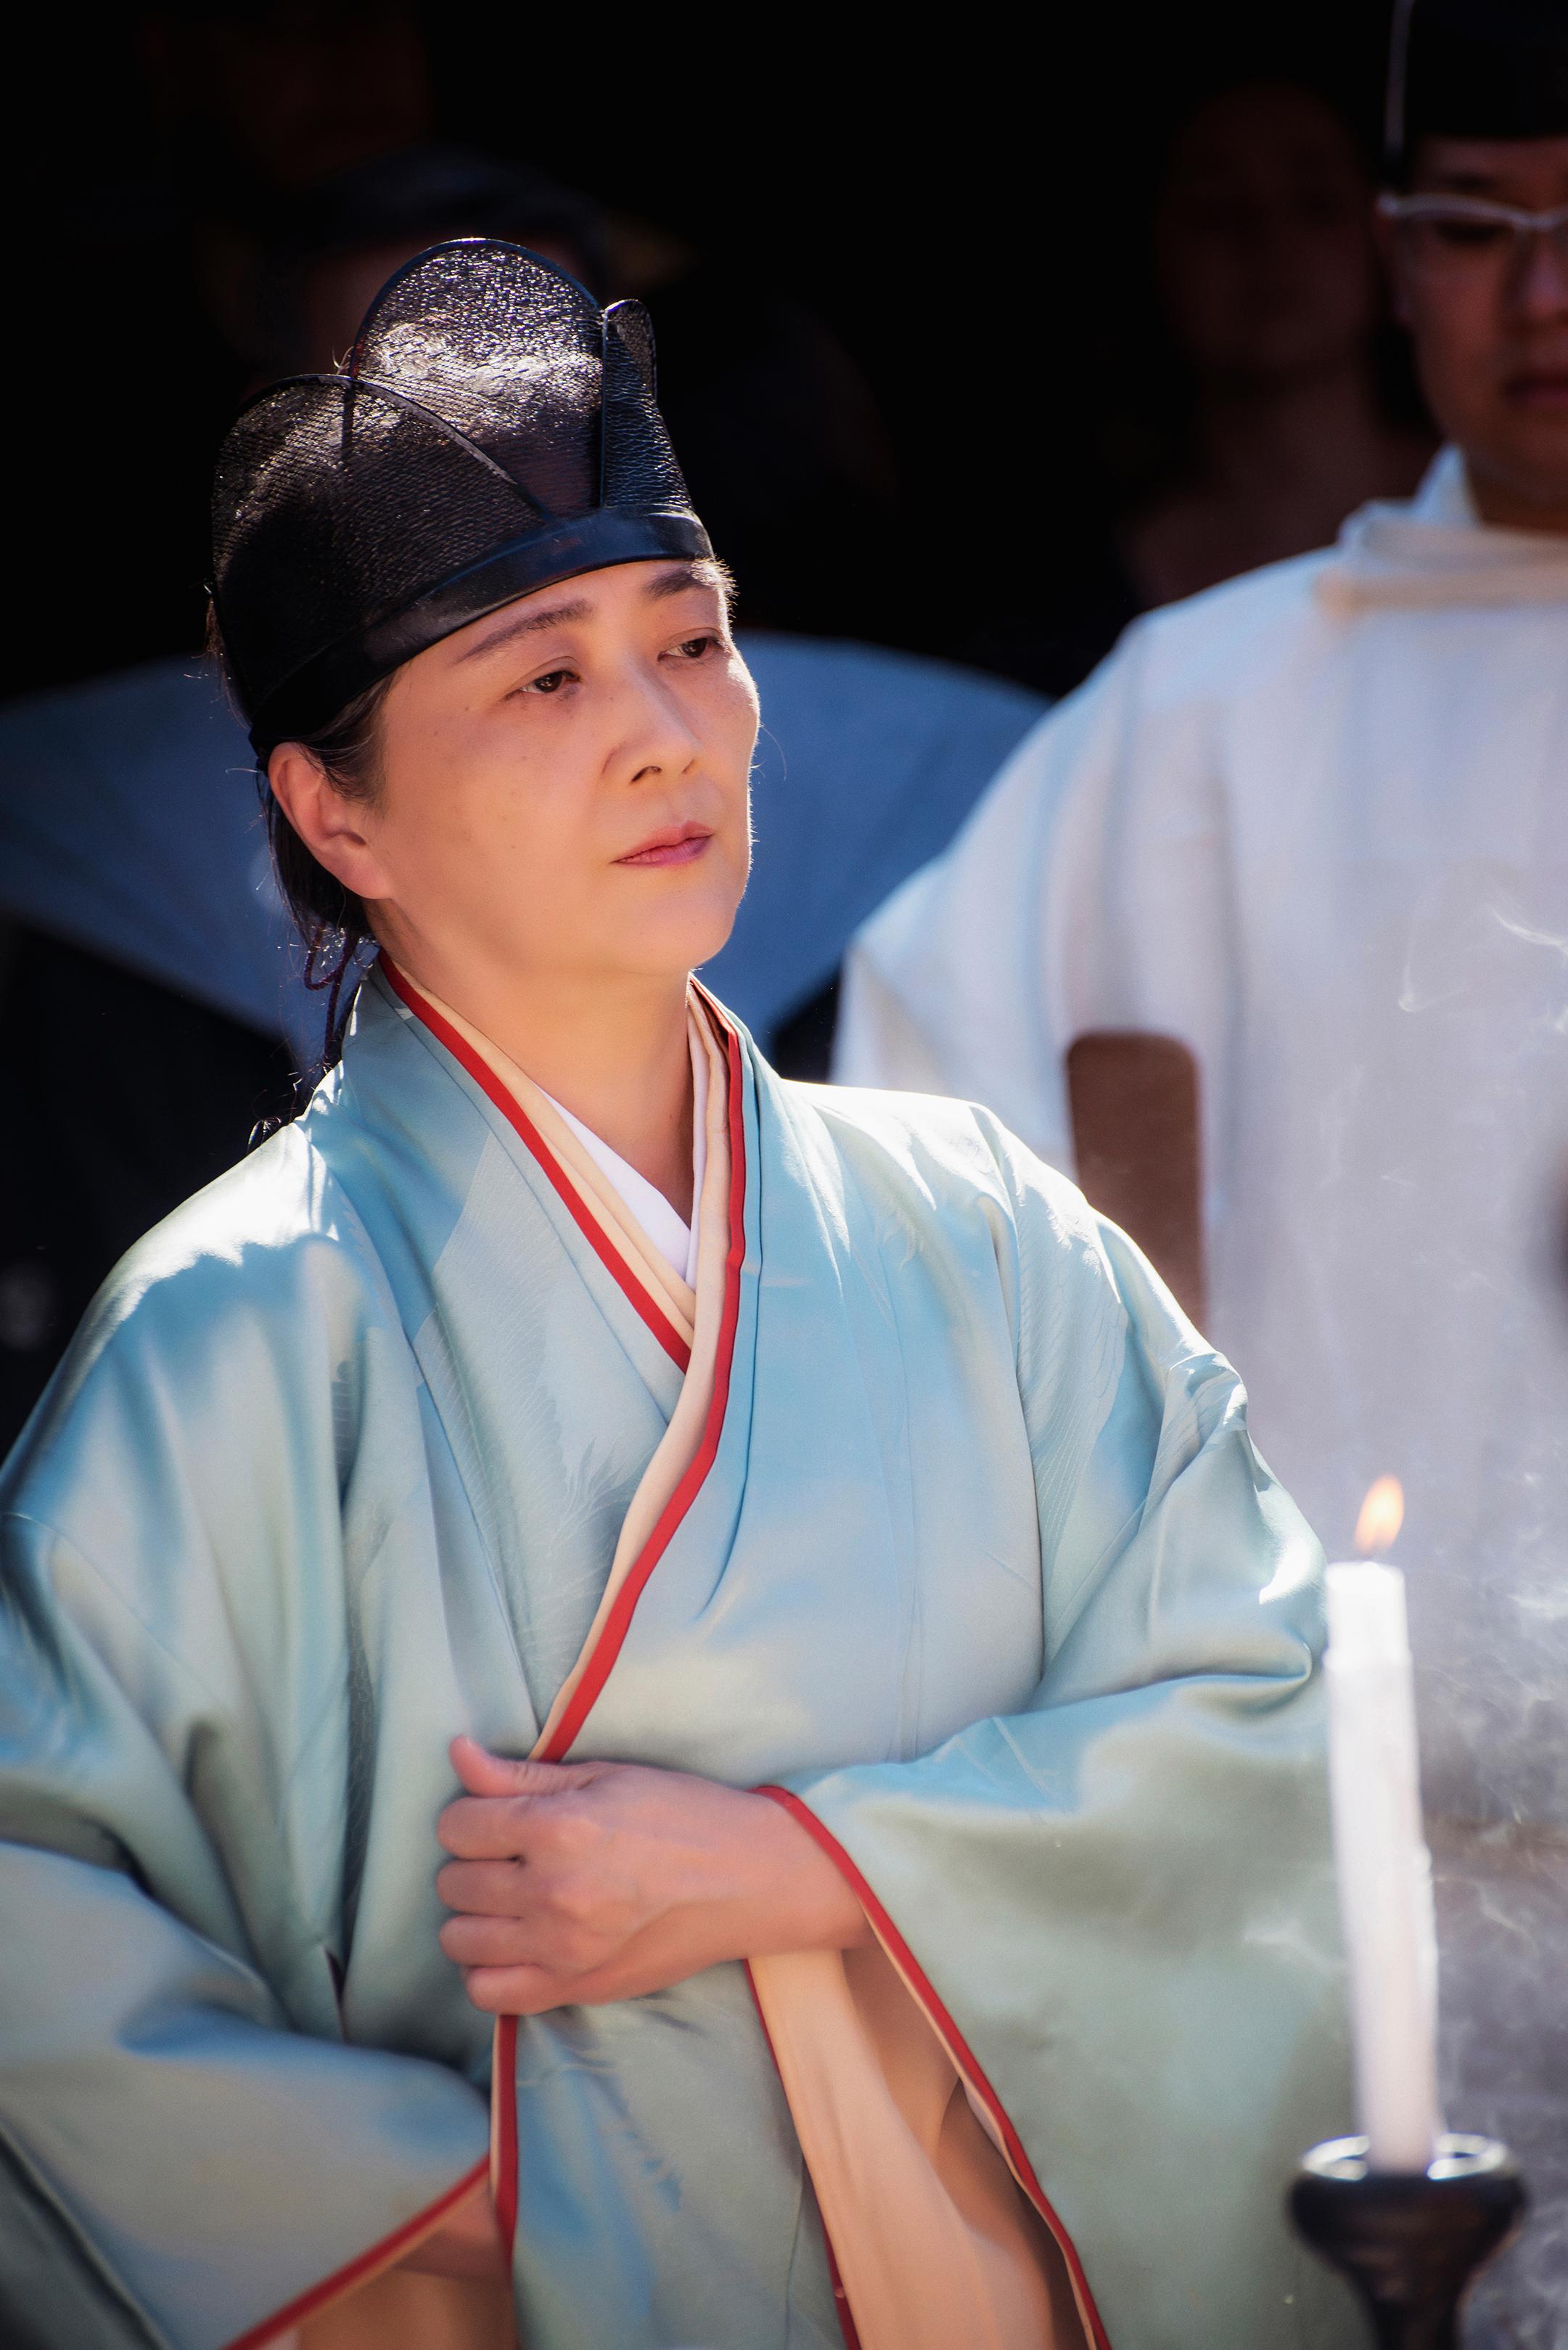 Jidai Matsuri Festival Kyoto Japan-7